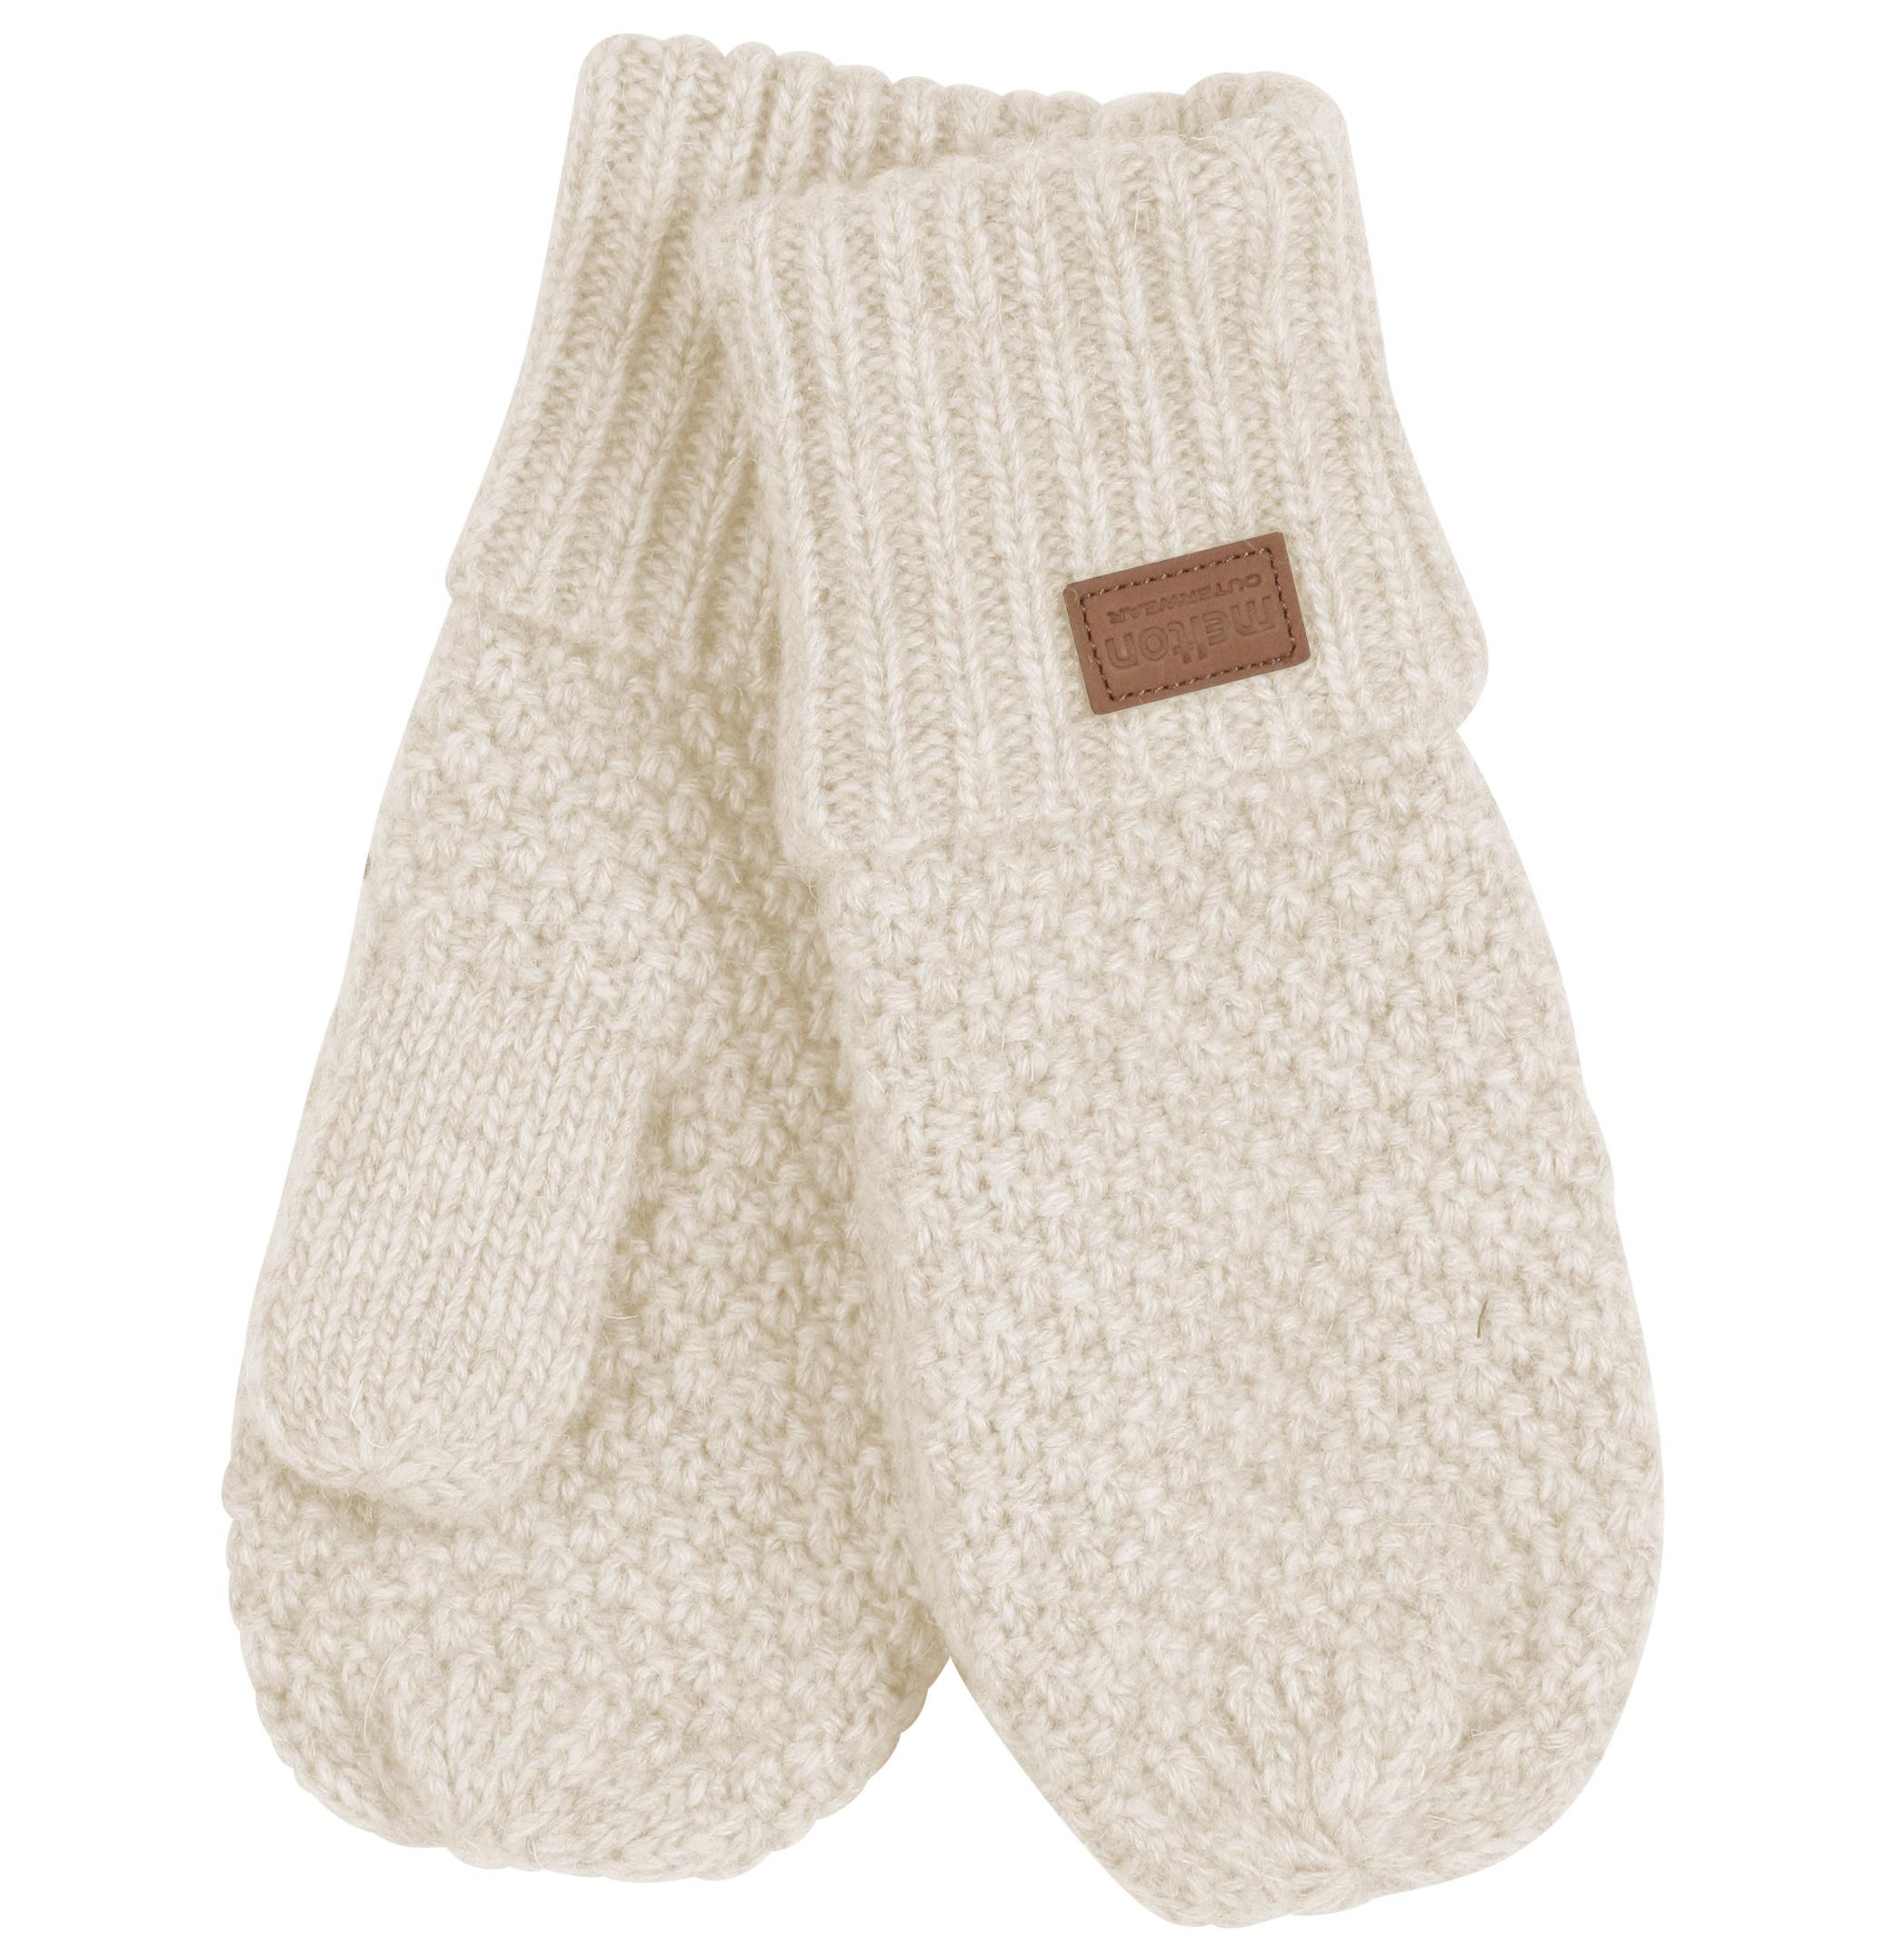 Melton - Lamb wool Sailor Mittens